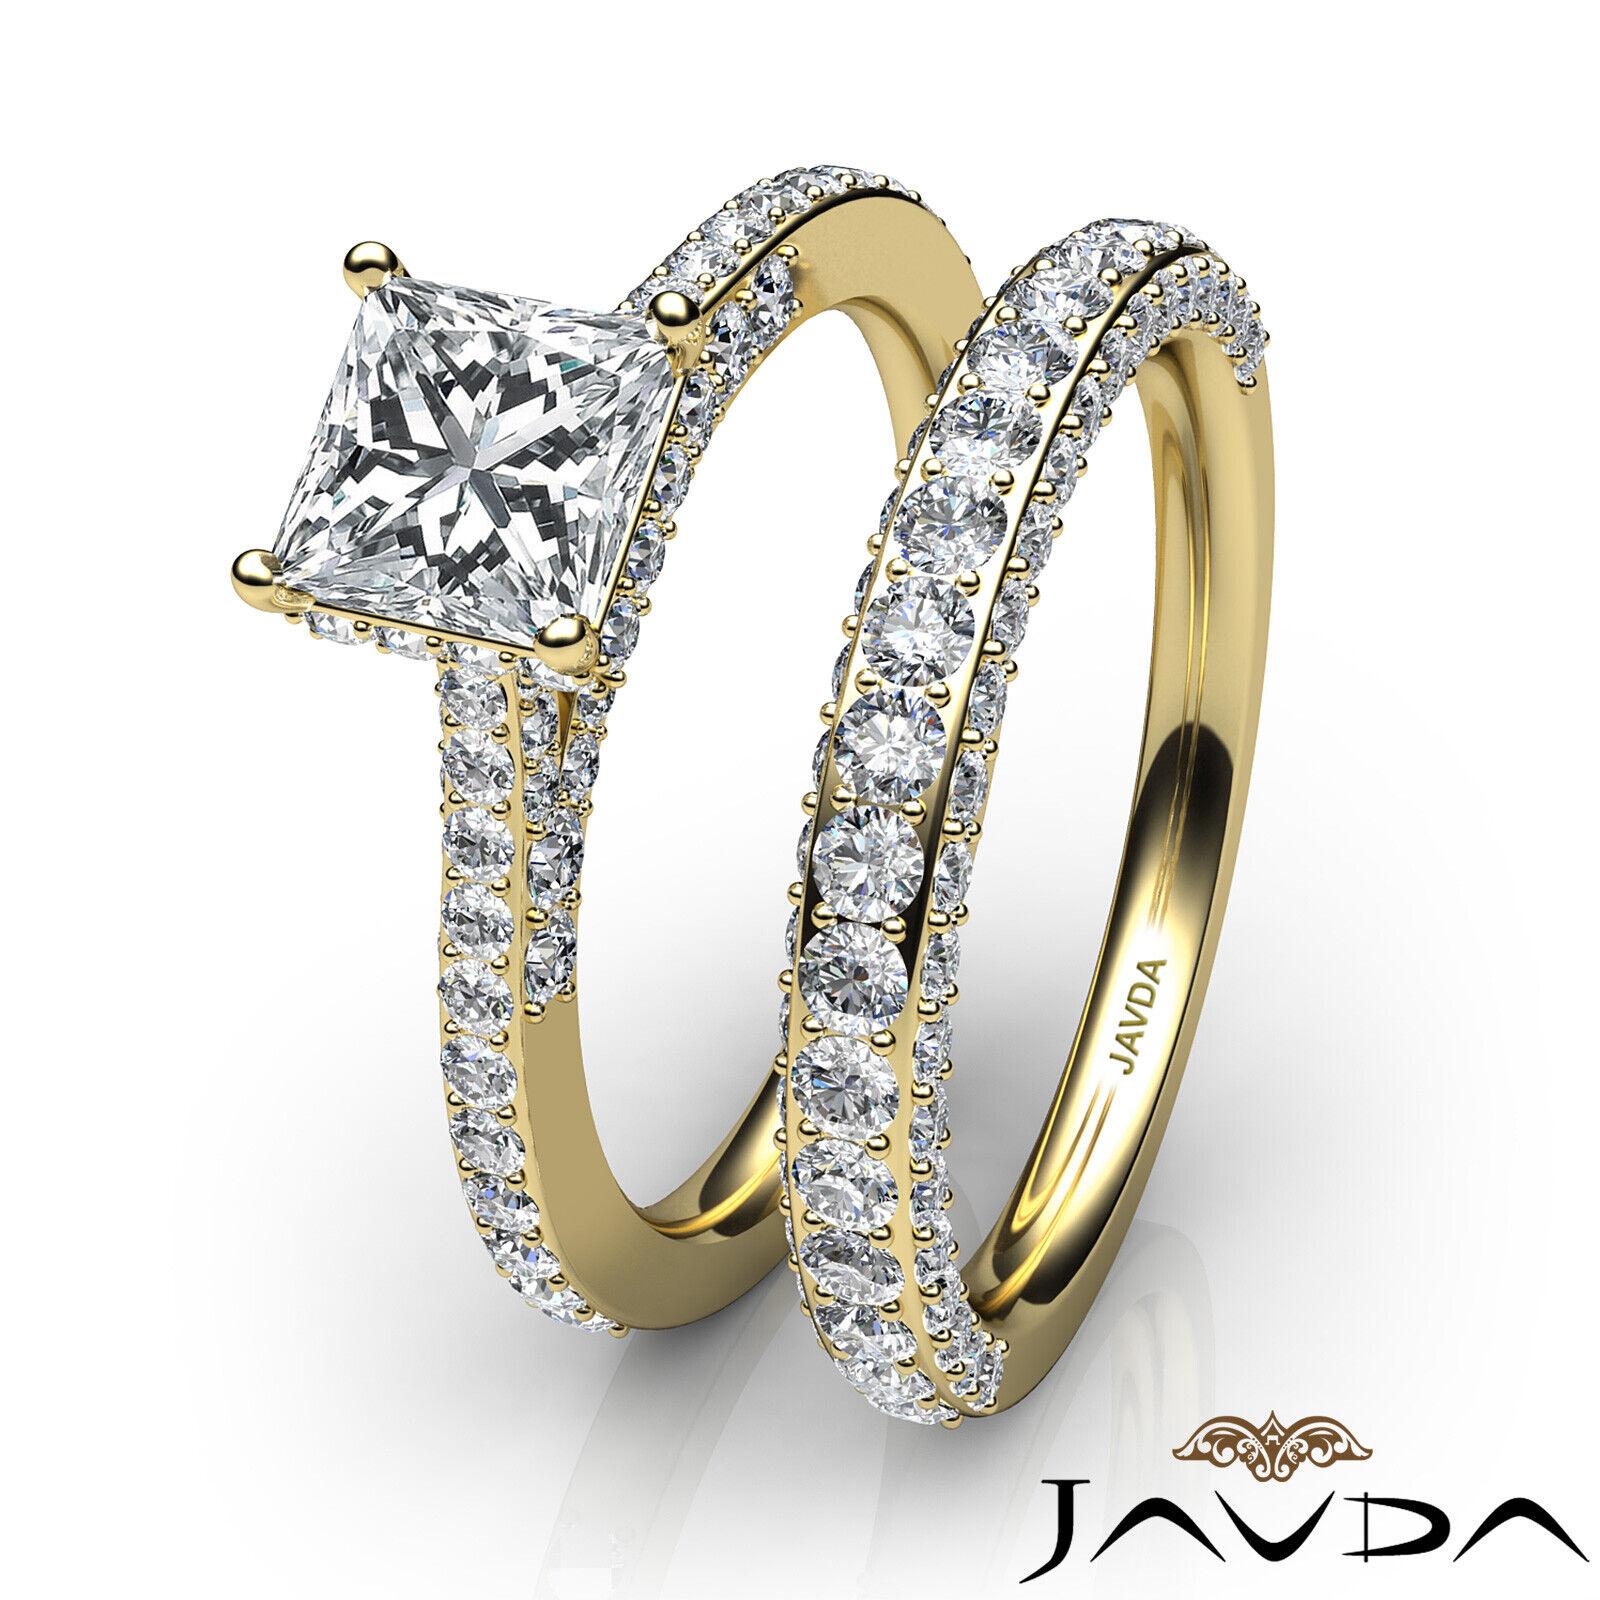 2.35ctw Circa Halo Pave Wedding Set Princess Diamond Engagement Ring GIA G-VVS1 11